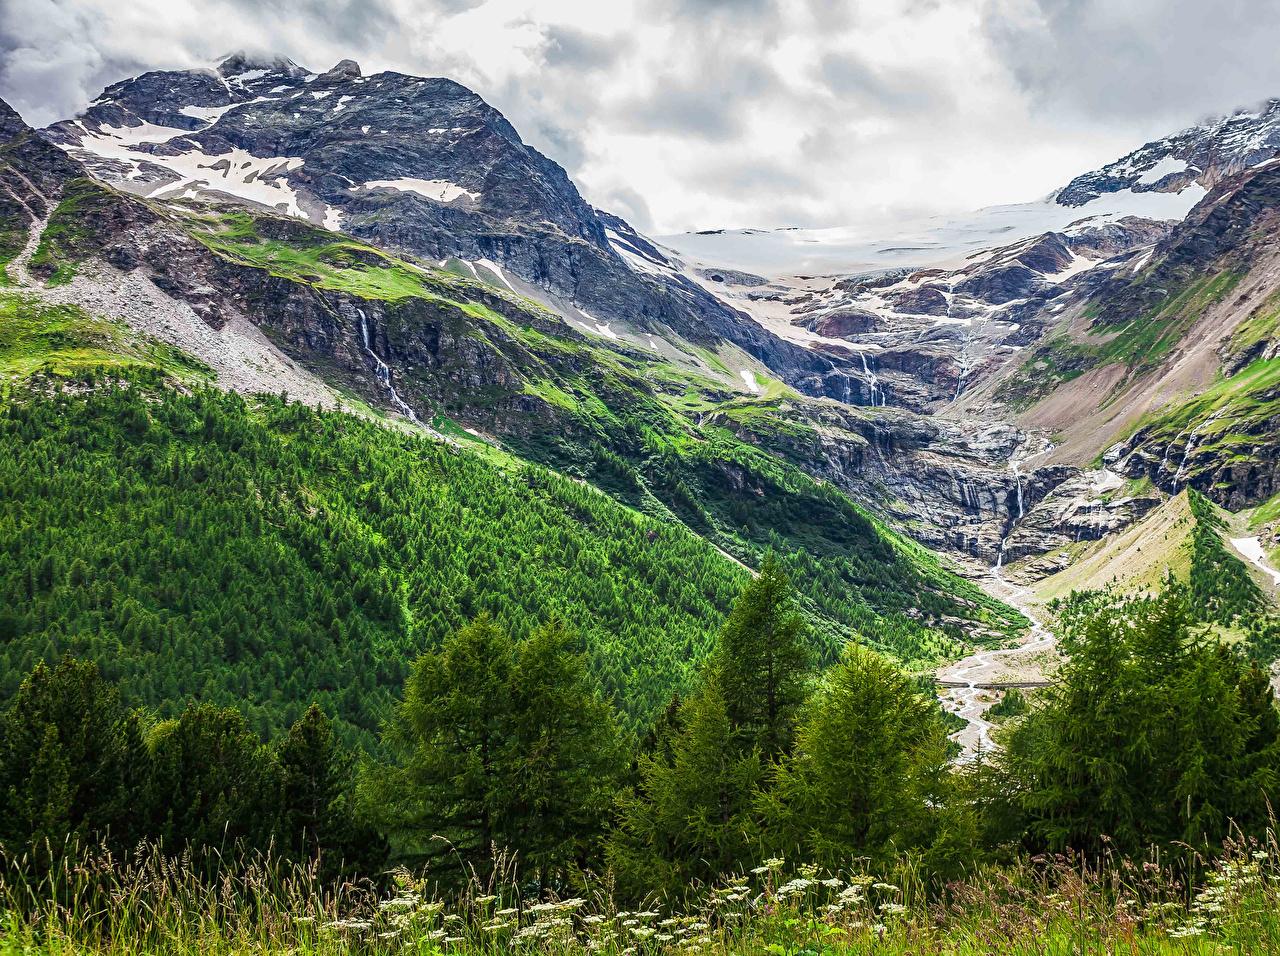 Wallpaper Switzerland Morteratsch Glacier Crag Nature Stream Mountains Forests Moss Rock brook Cliff Creek Creeks Streams mountain forest